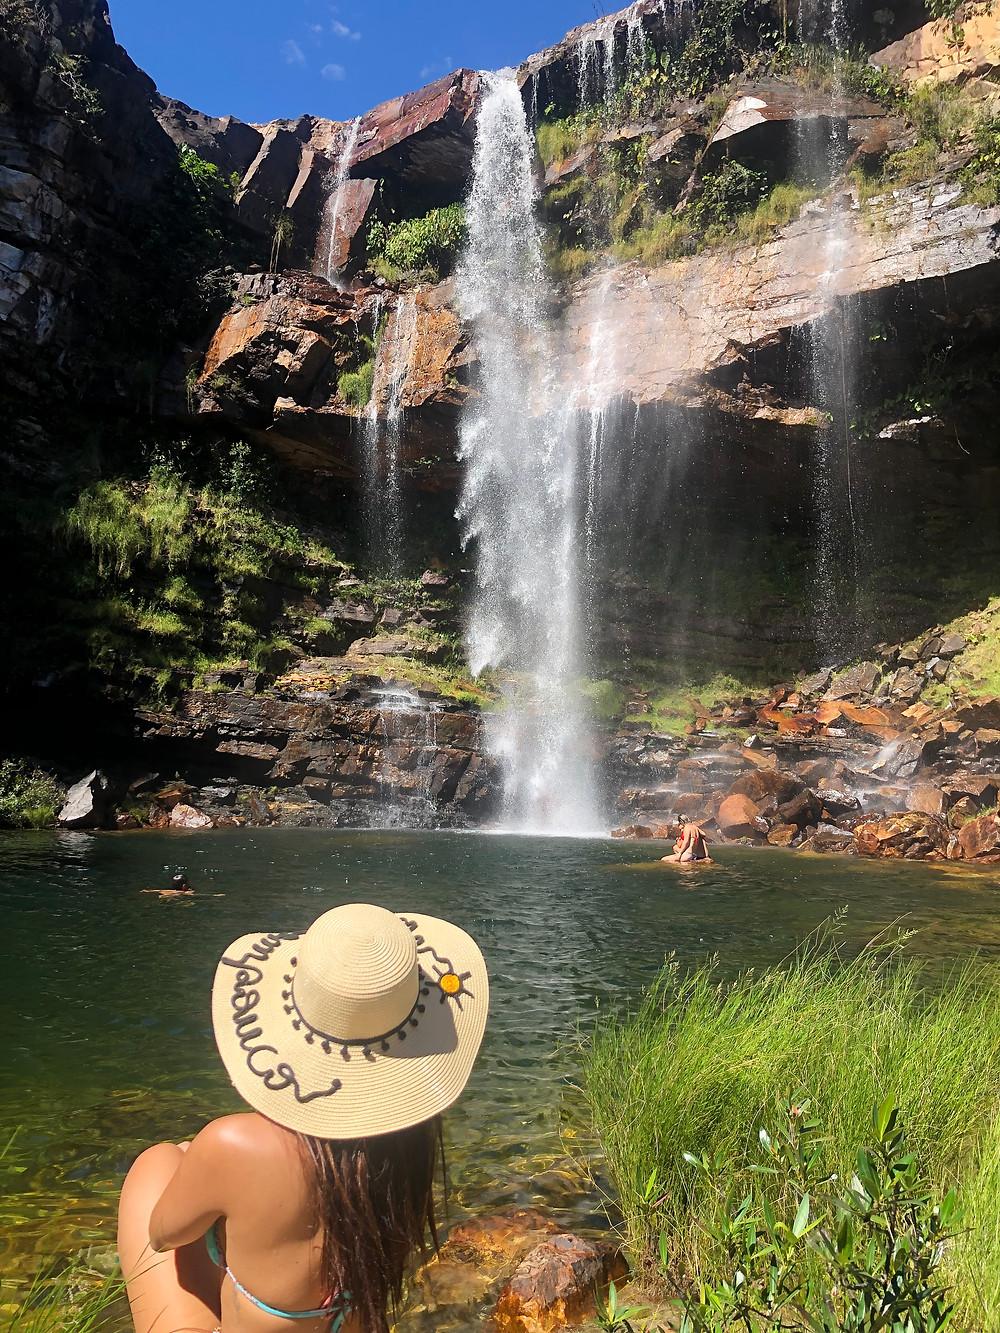 Cachoeira do Cordovil - Chapada dos Veadeiros